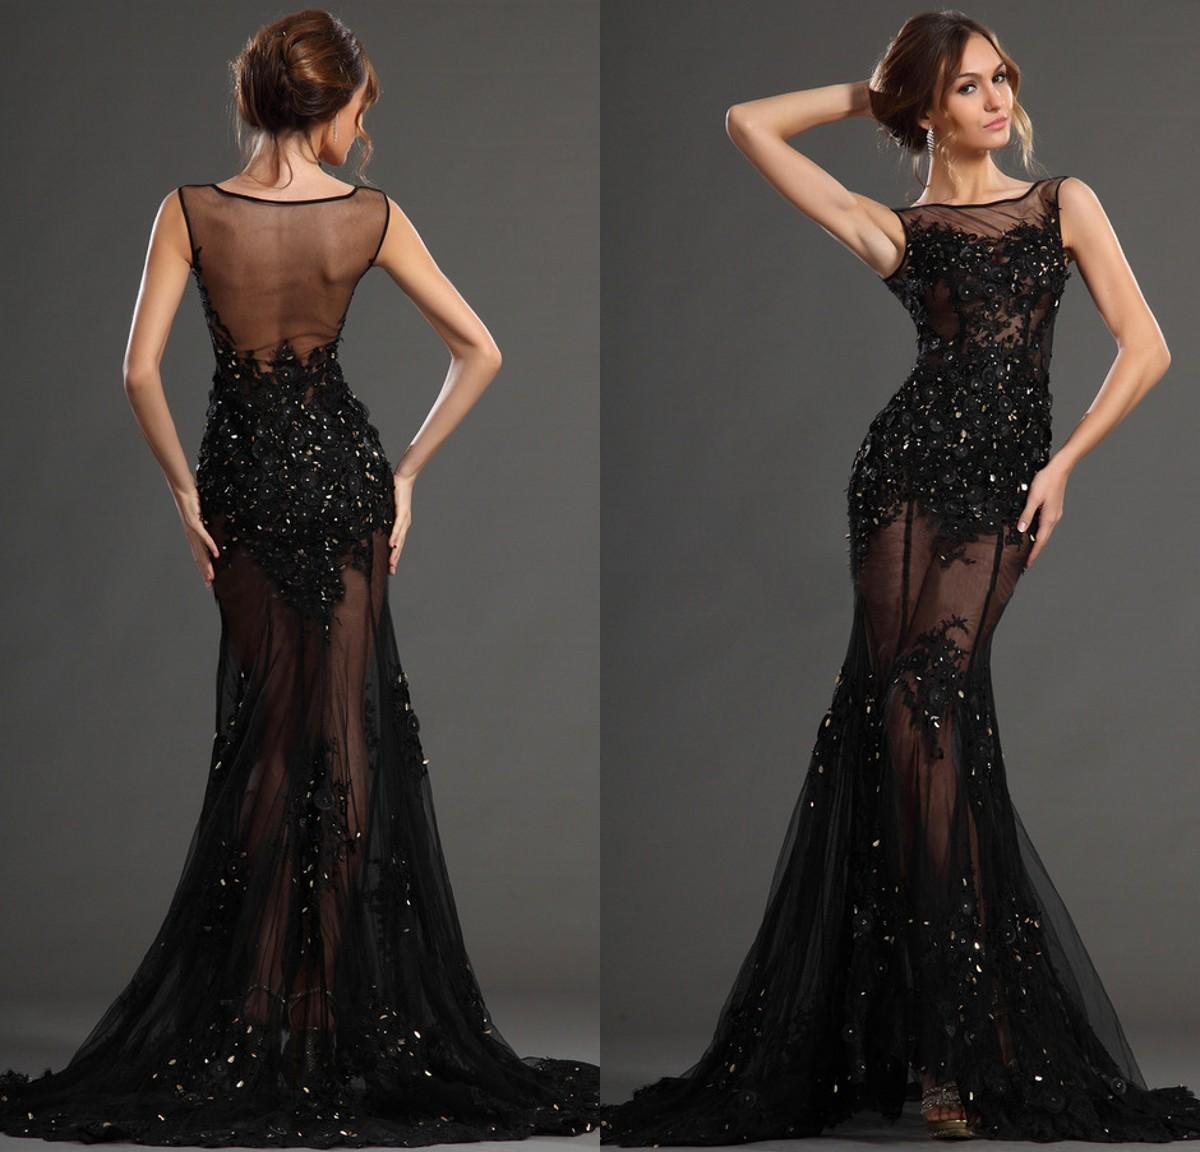 Sexy 2017 Long Black Dresses Evening Wear From Eiffelbride Bateau ...